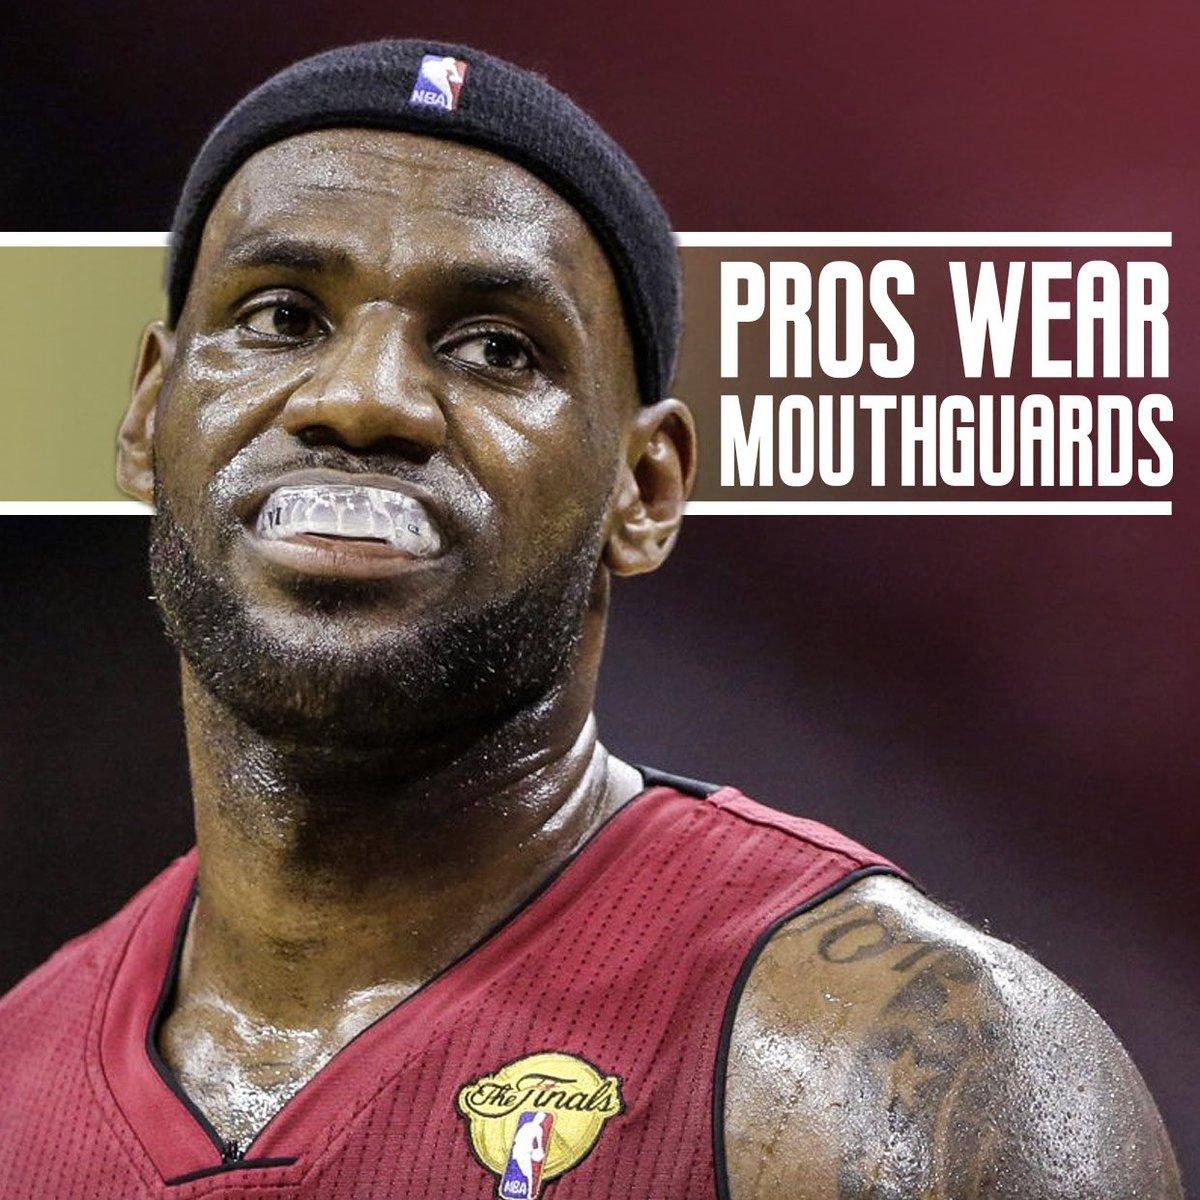 Basketball Mouthguard Hashtag On Twitter